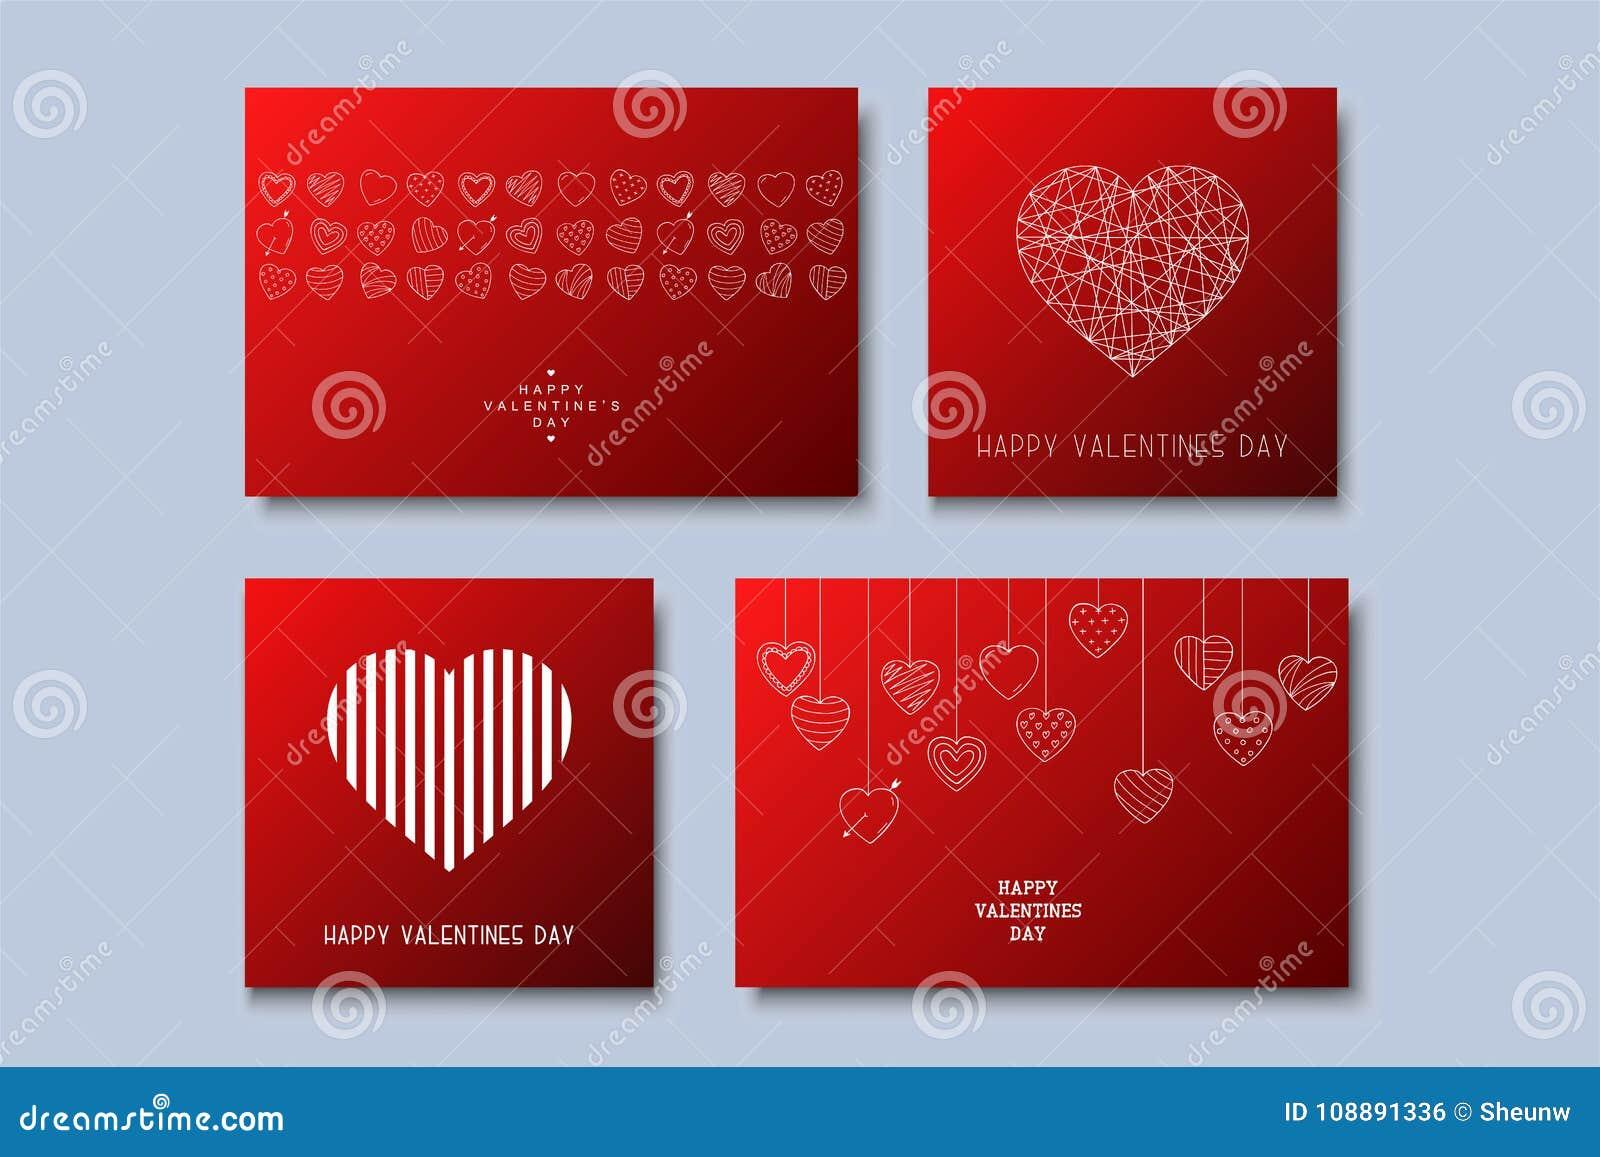 Set Of Stylish Greeting Cardspostersbrochures Happy Valentines